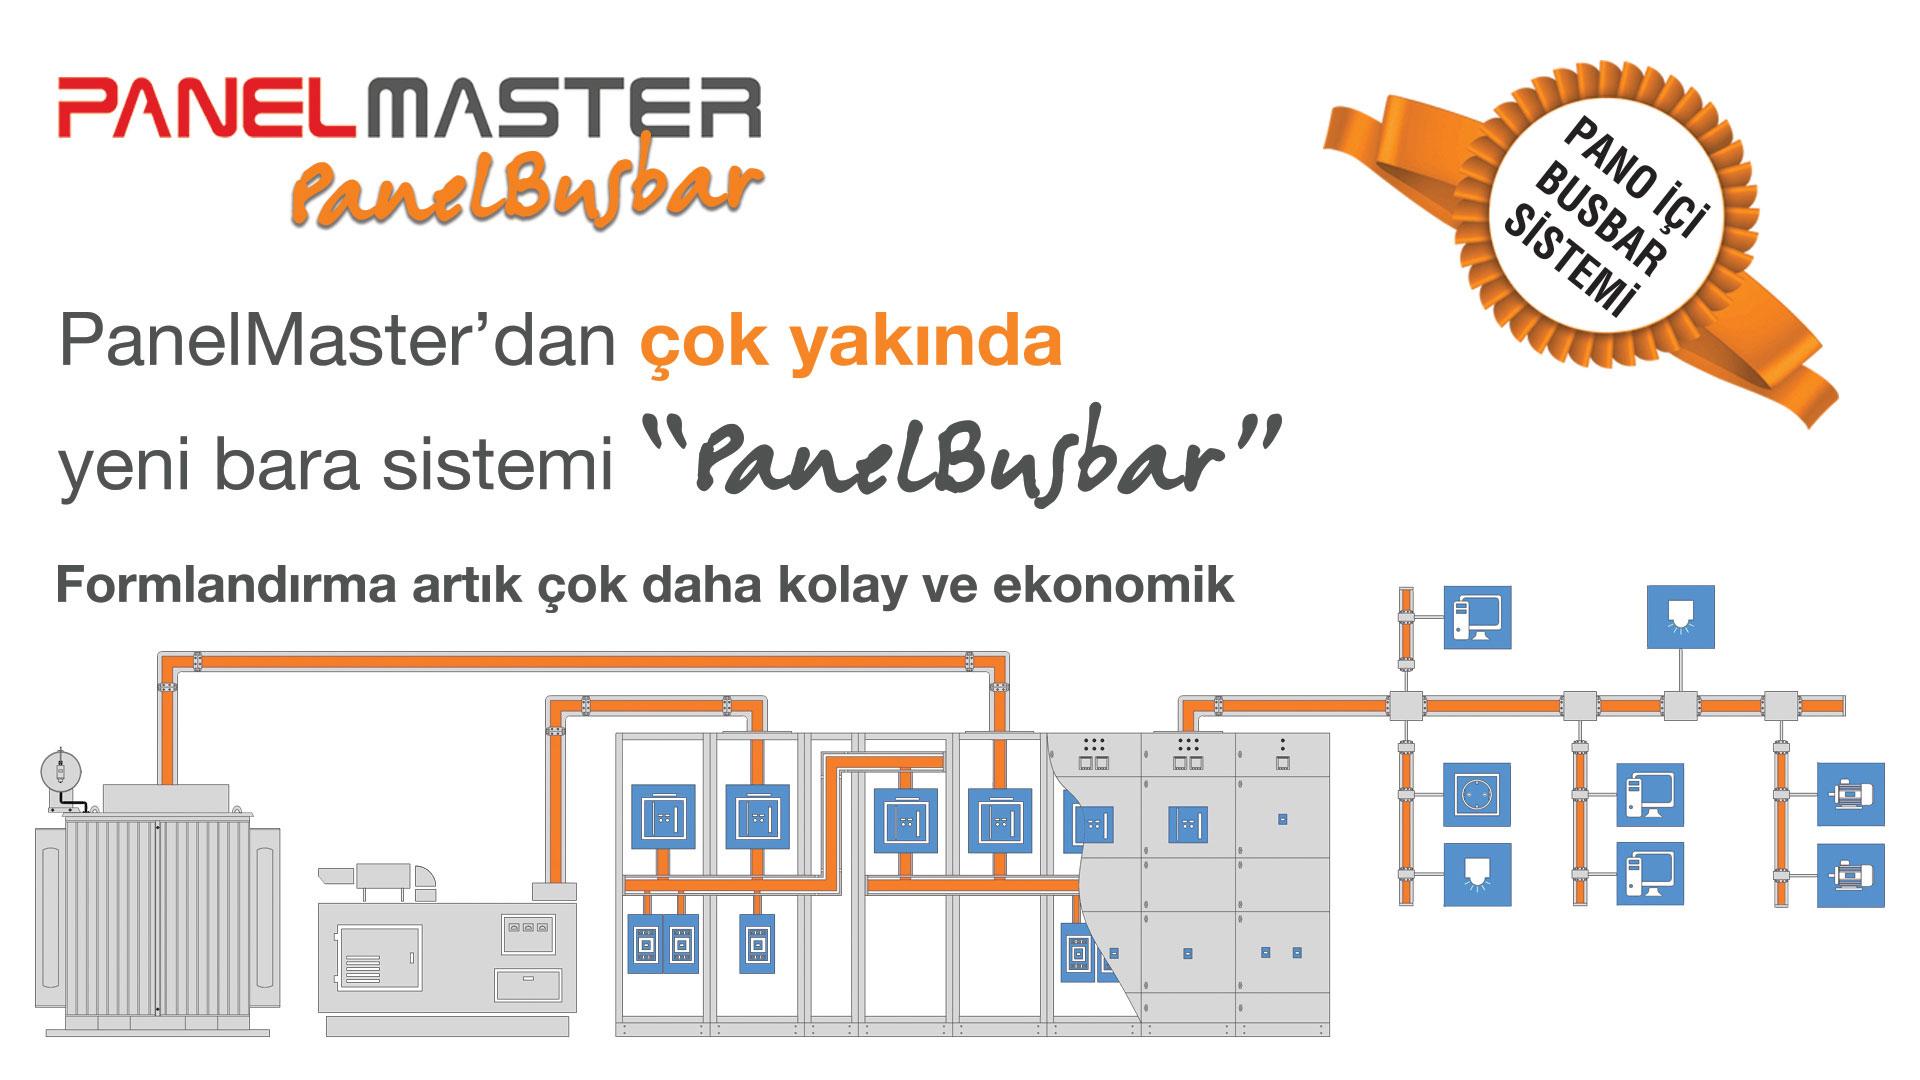 PanelMaster'dan yeni bara sistemi PanelBusbar